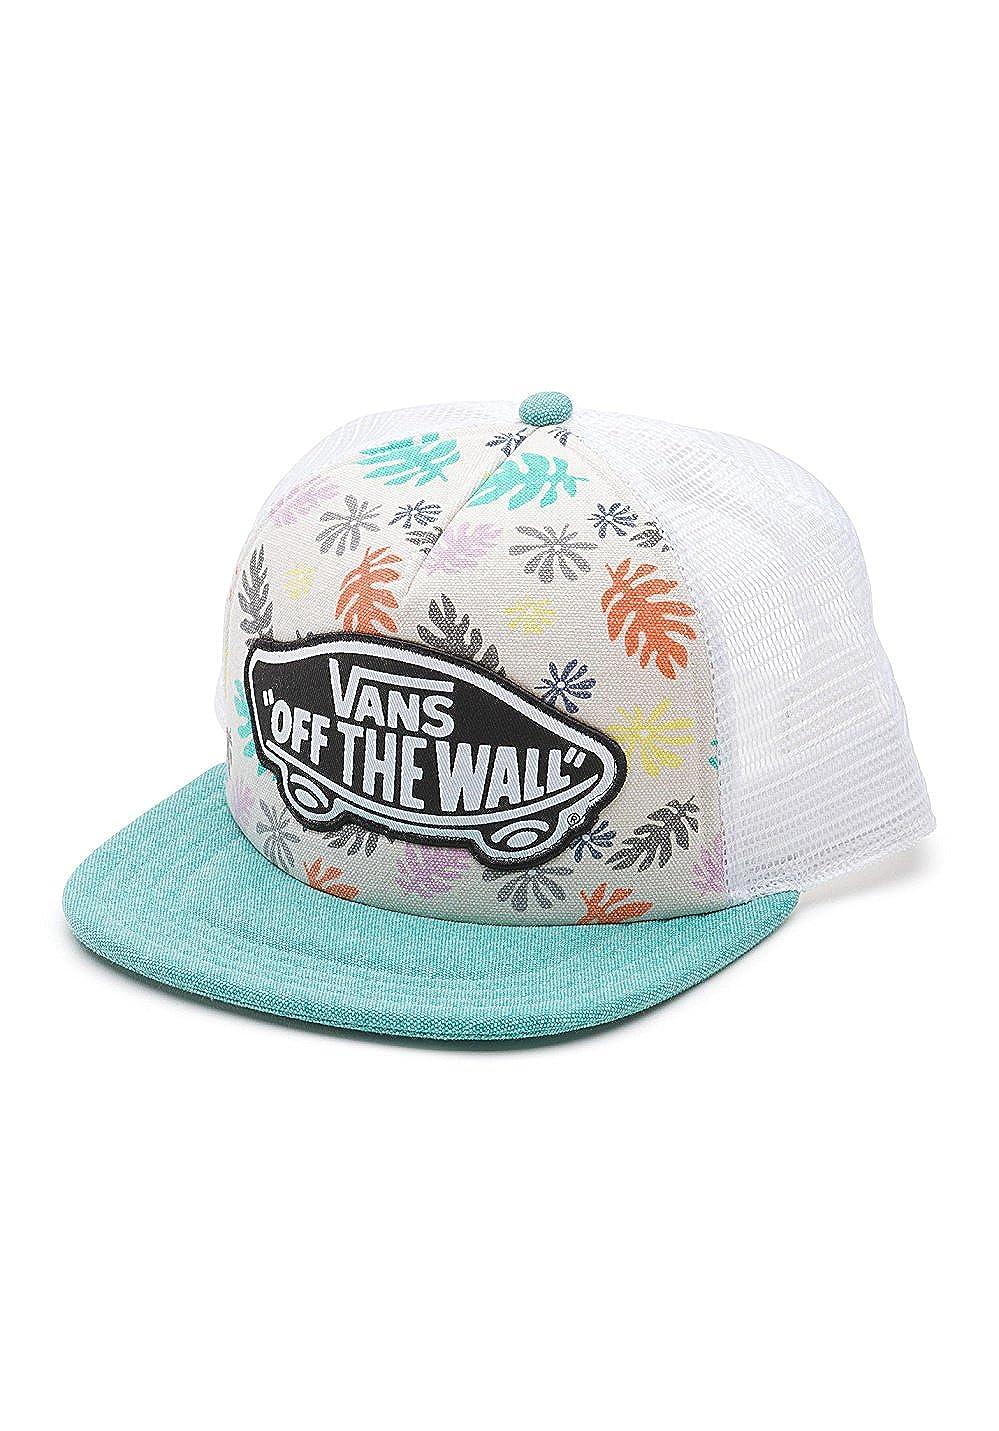 7c8b89e2c57 Vans Off The Wall Women s Beach Girl Trucker Hat Cap - Kelp at Amazon  Women s Clothing store